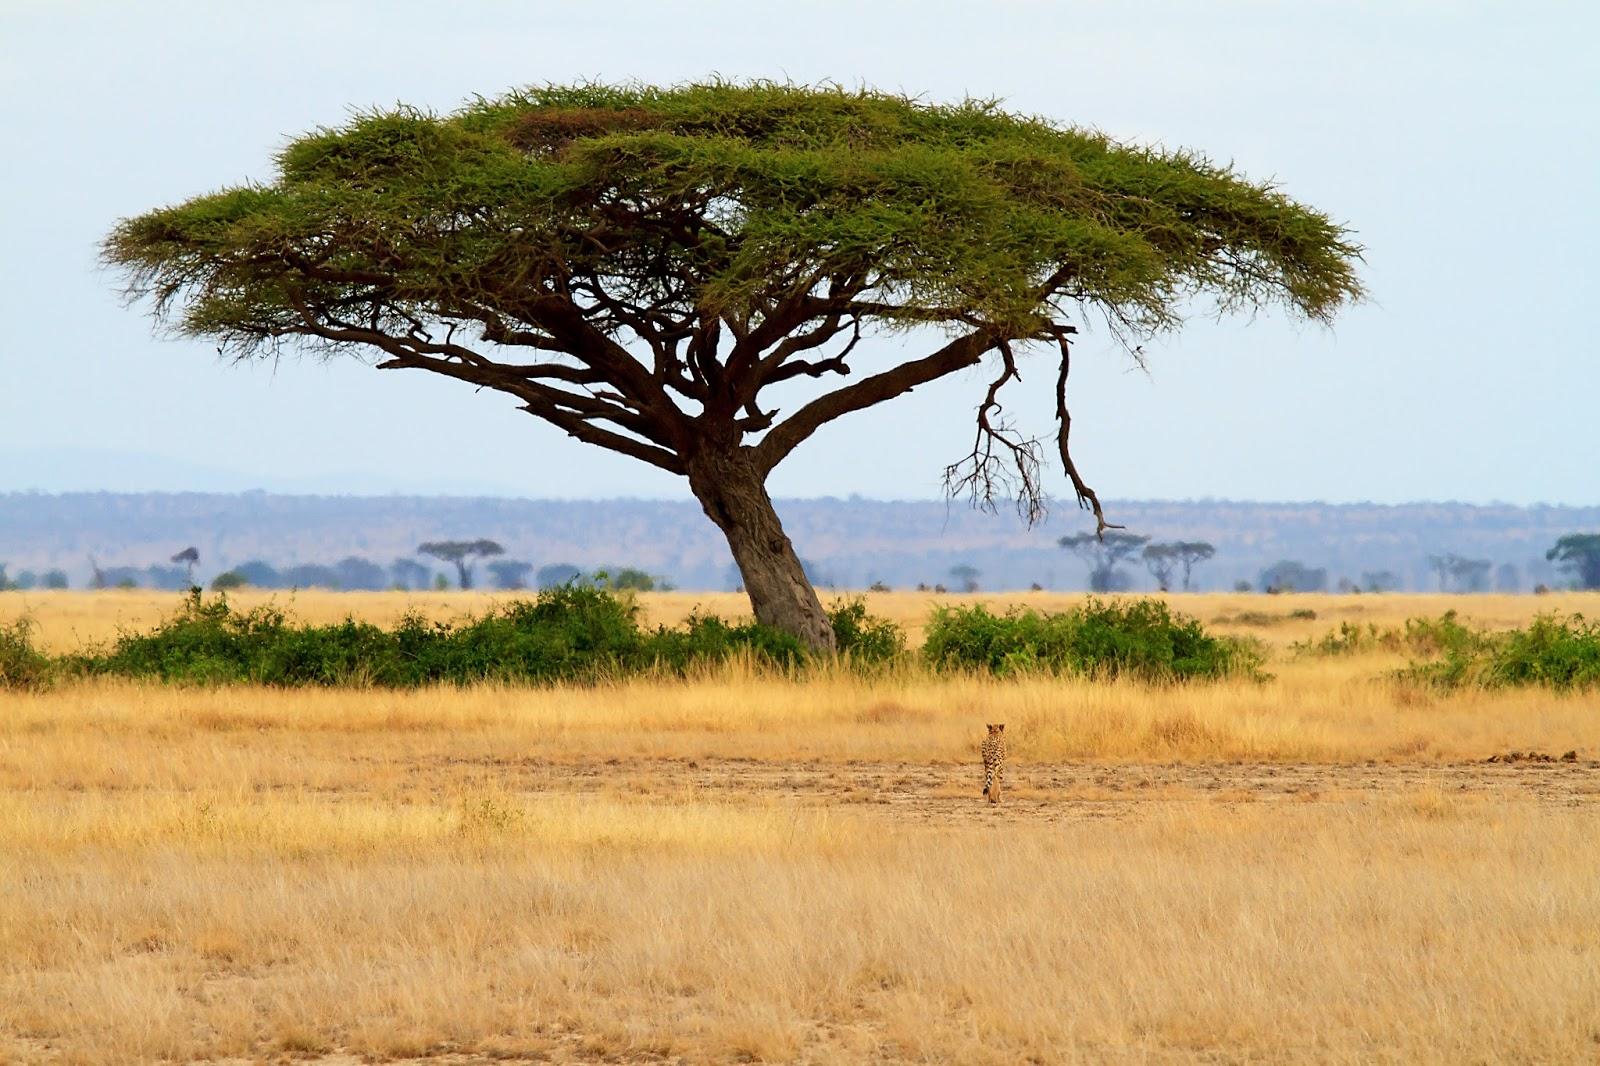 Marie laval alicia dean on africa romance and acacia trees for Acacia albero